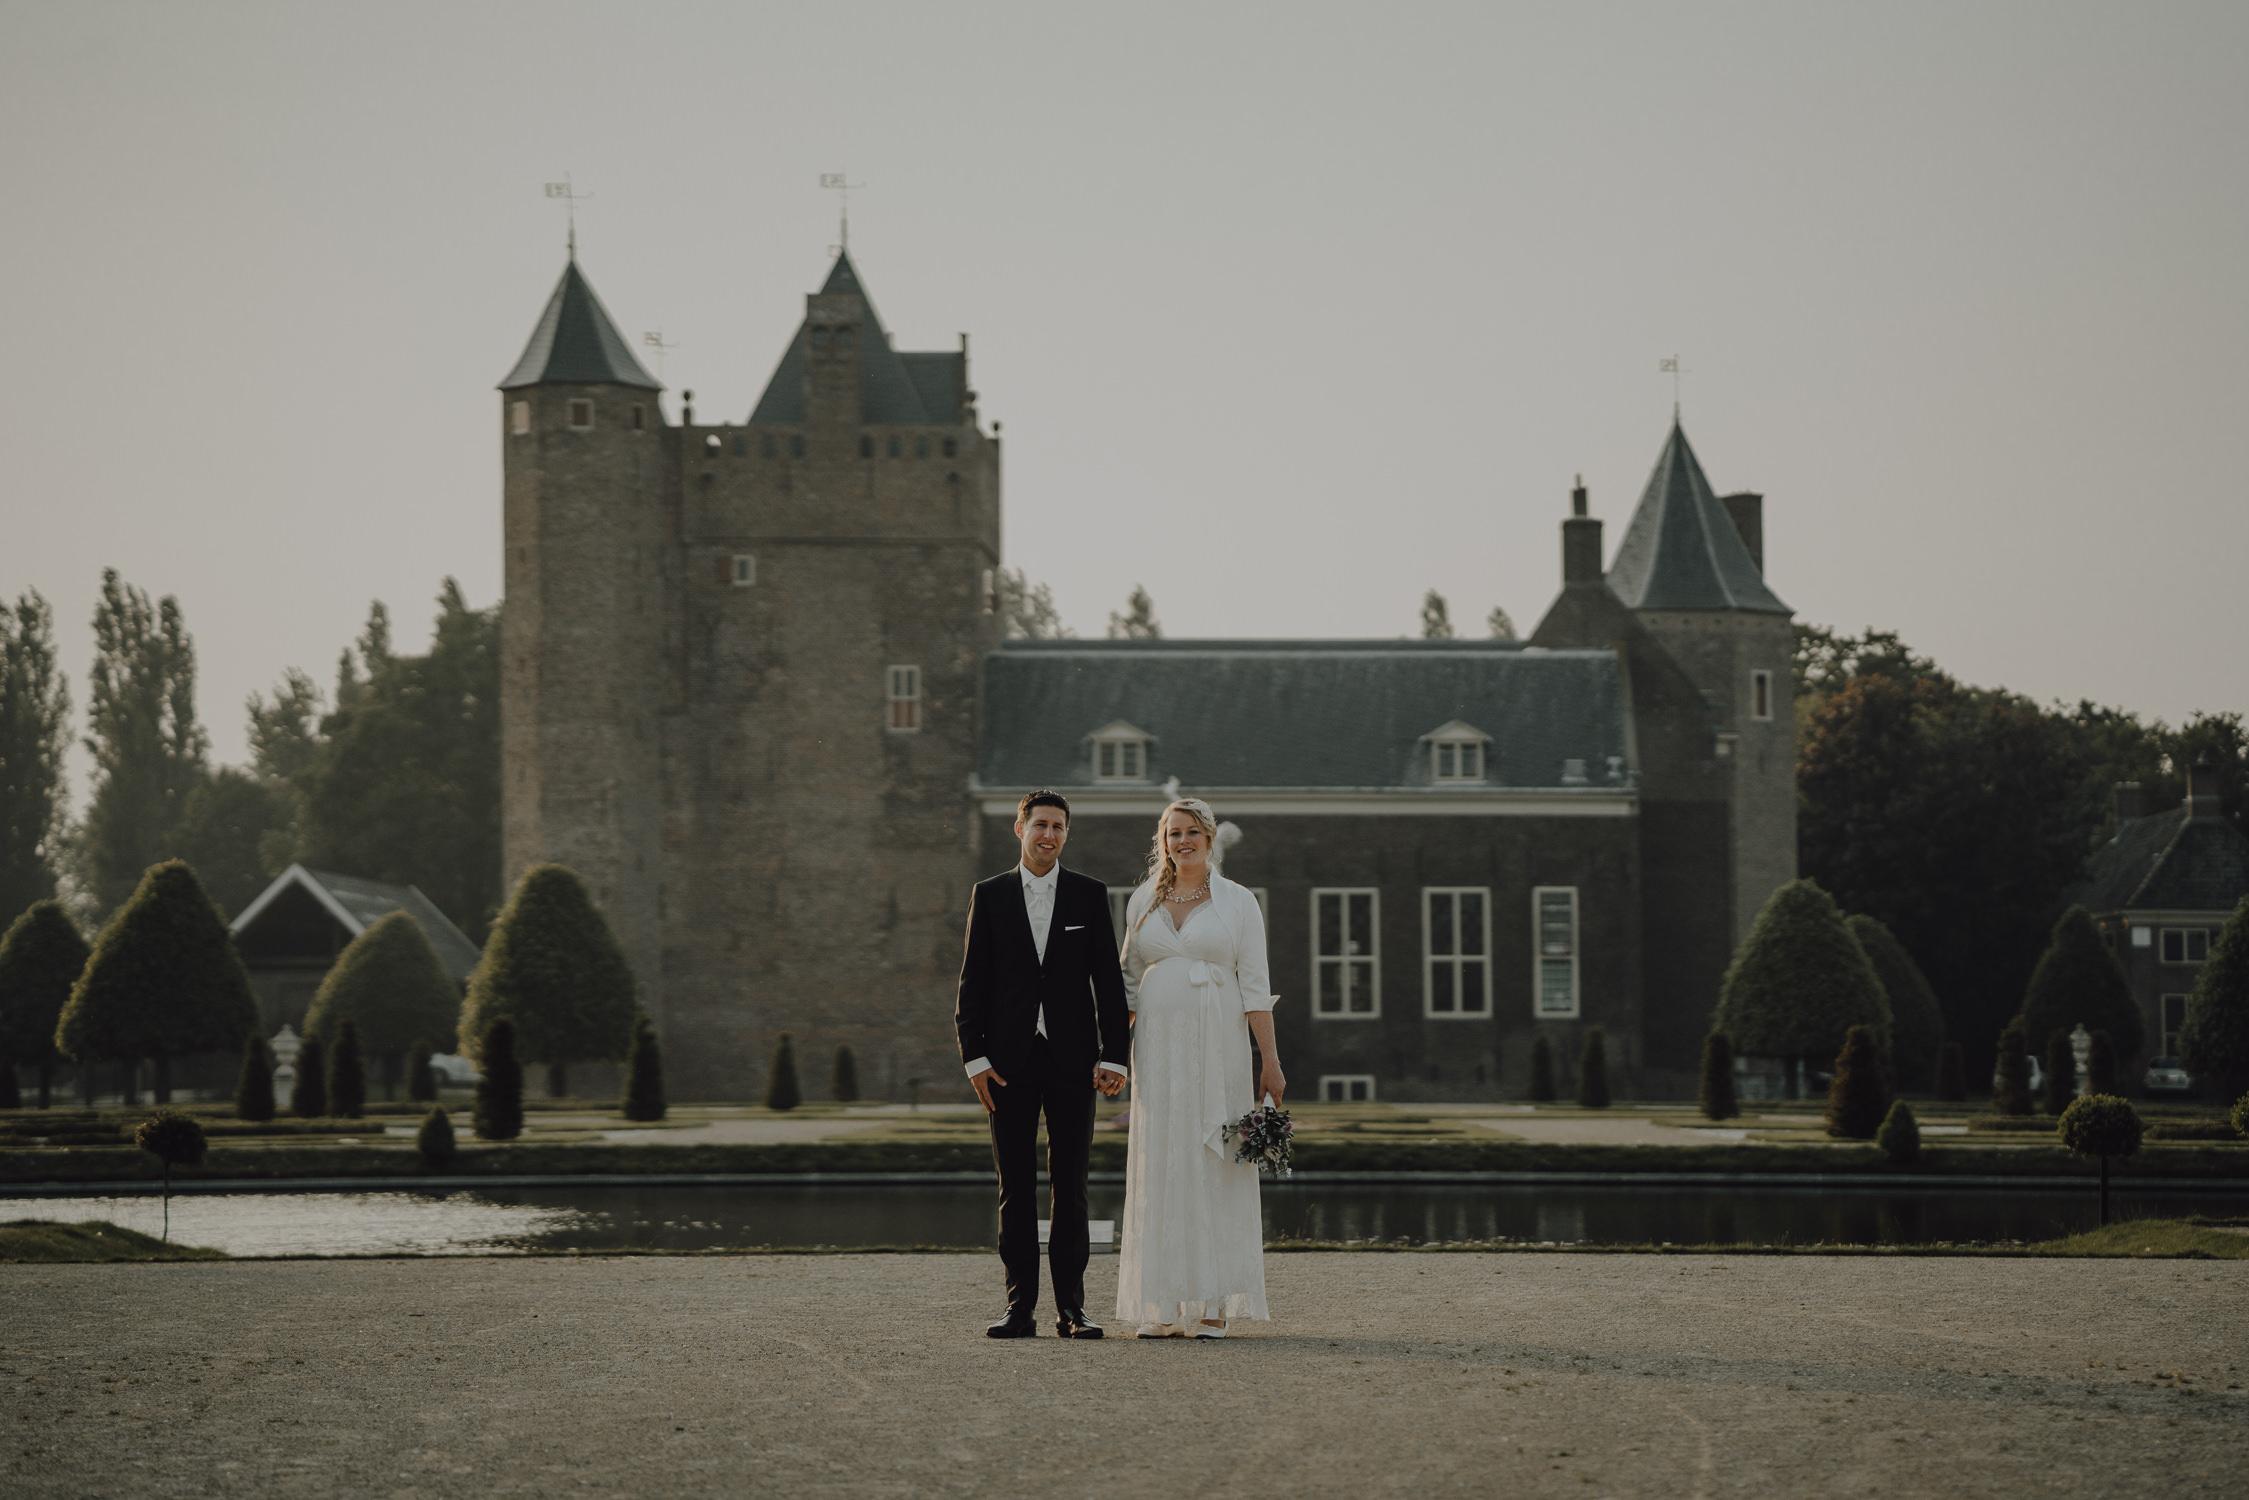 bruidsfotografie-amsterdam-utrecht-mark-hadden-wedding-photography-rowan-gideon-478.jpg